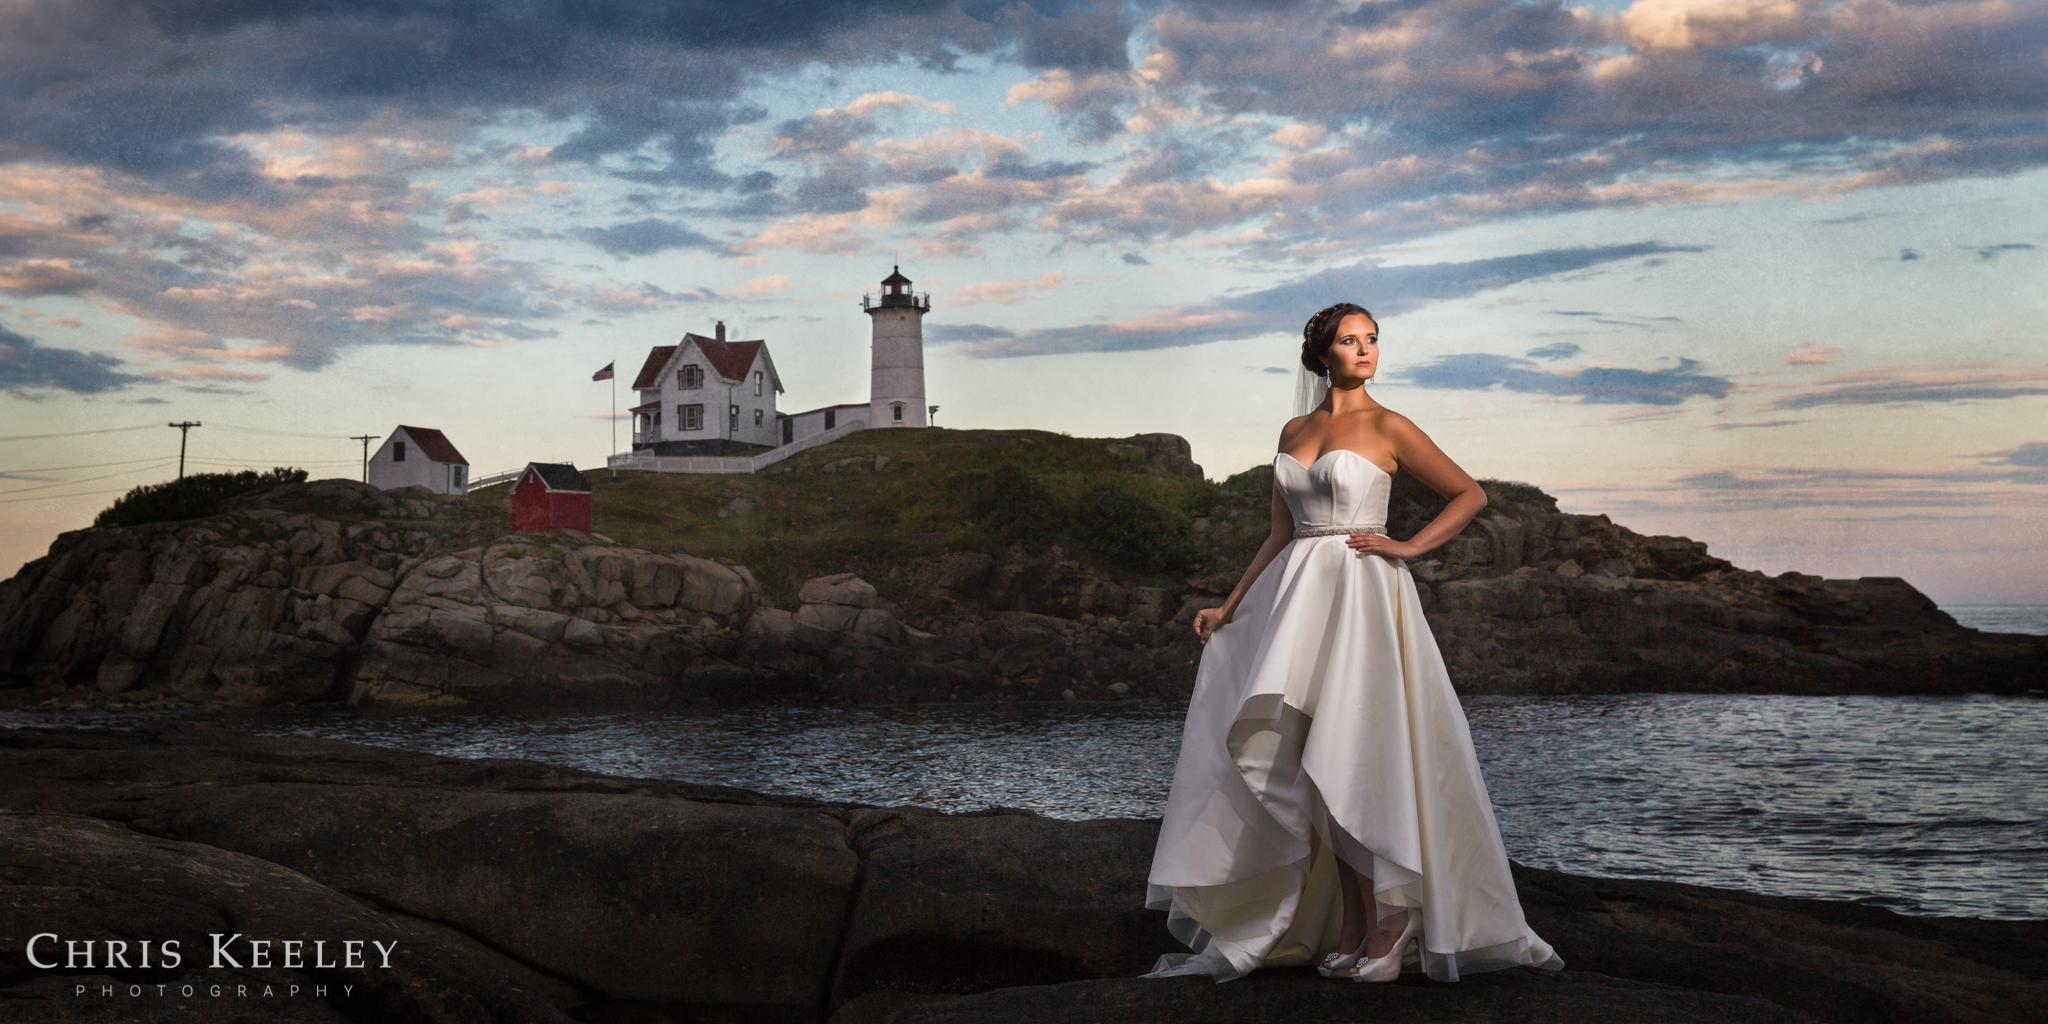 york-cape-neddick-nubble-light-maine-bride-wedding-chris-keeley-photography-04.jpg